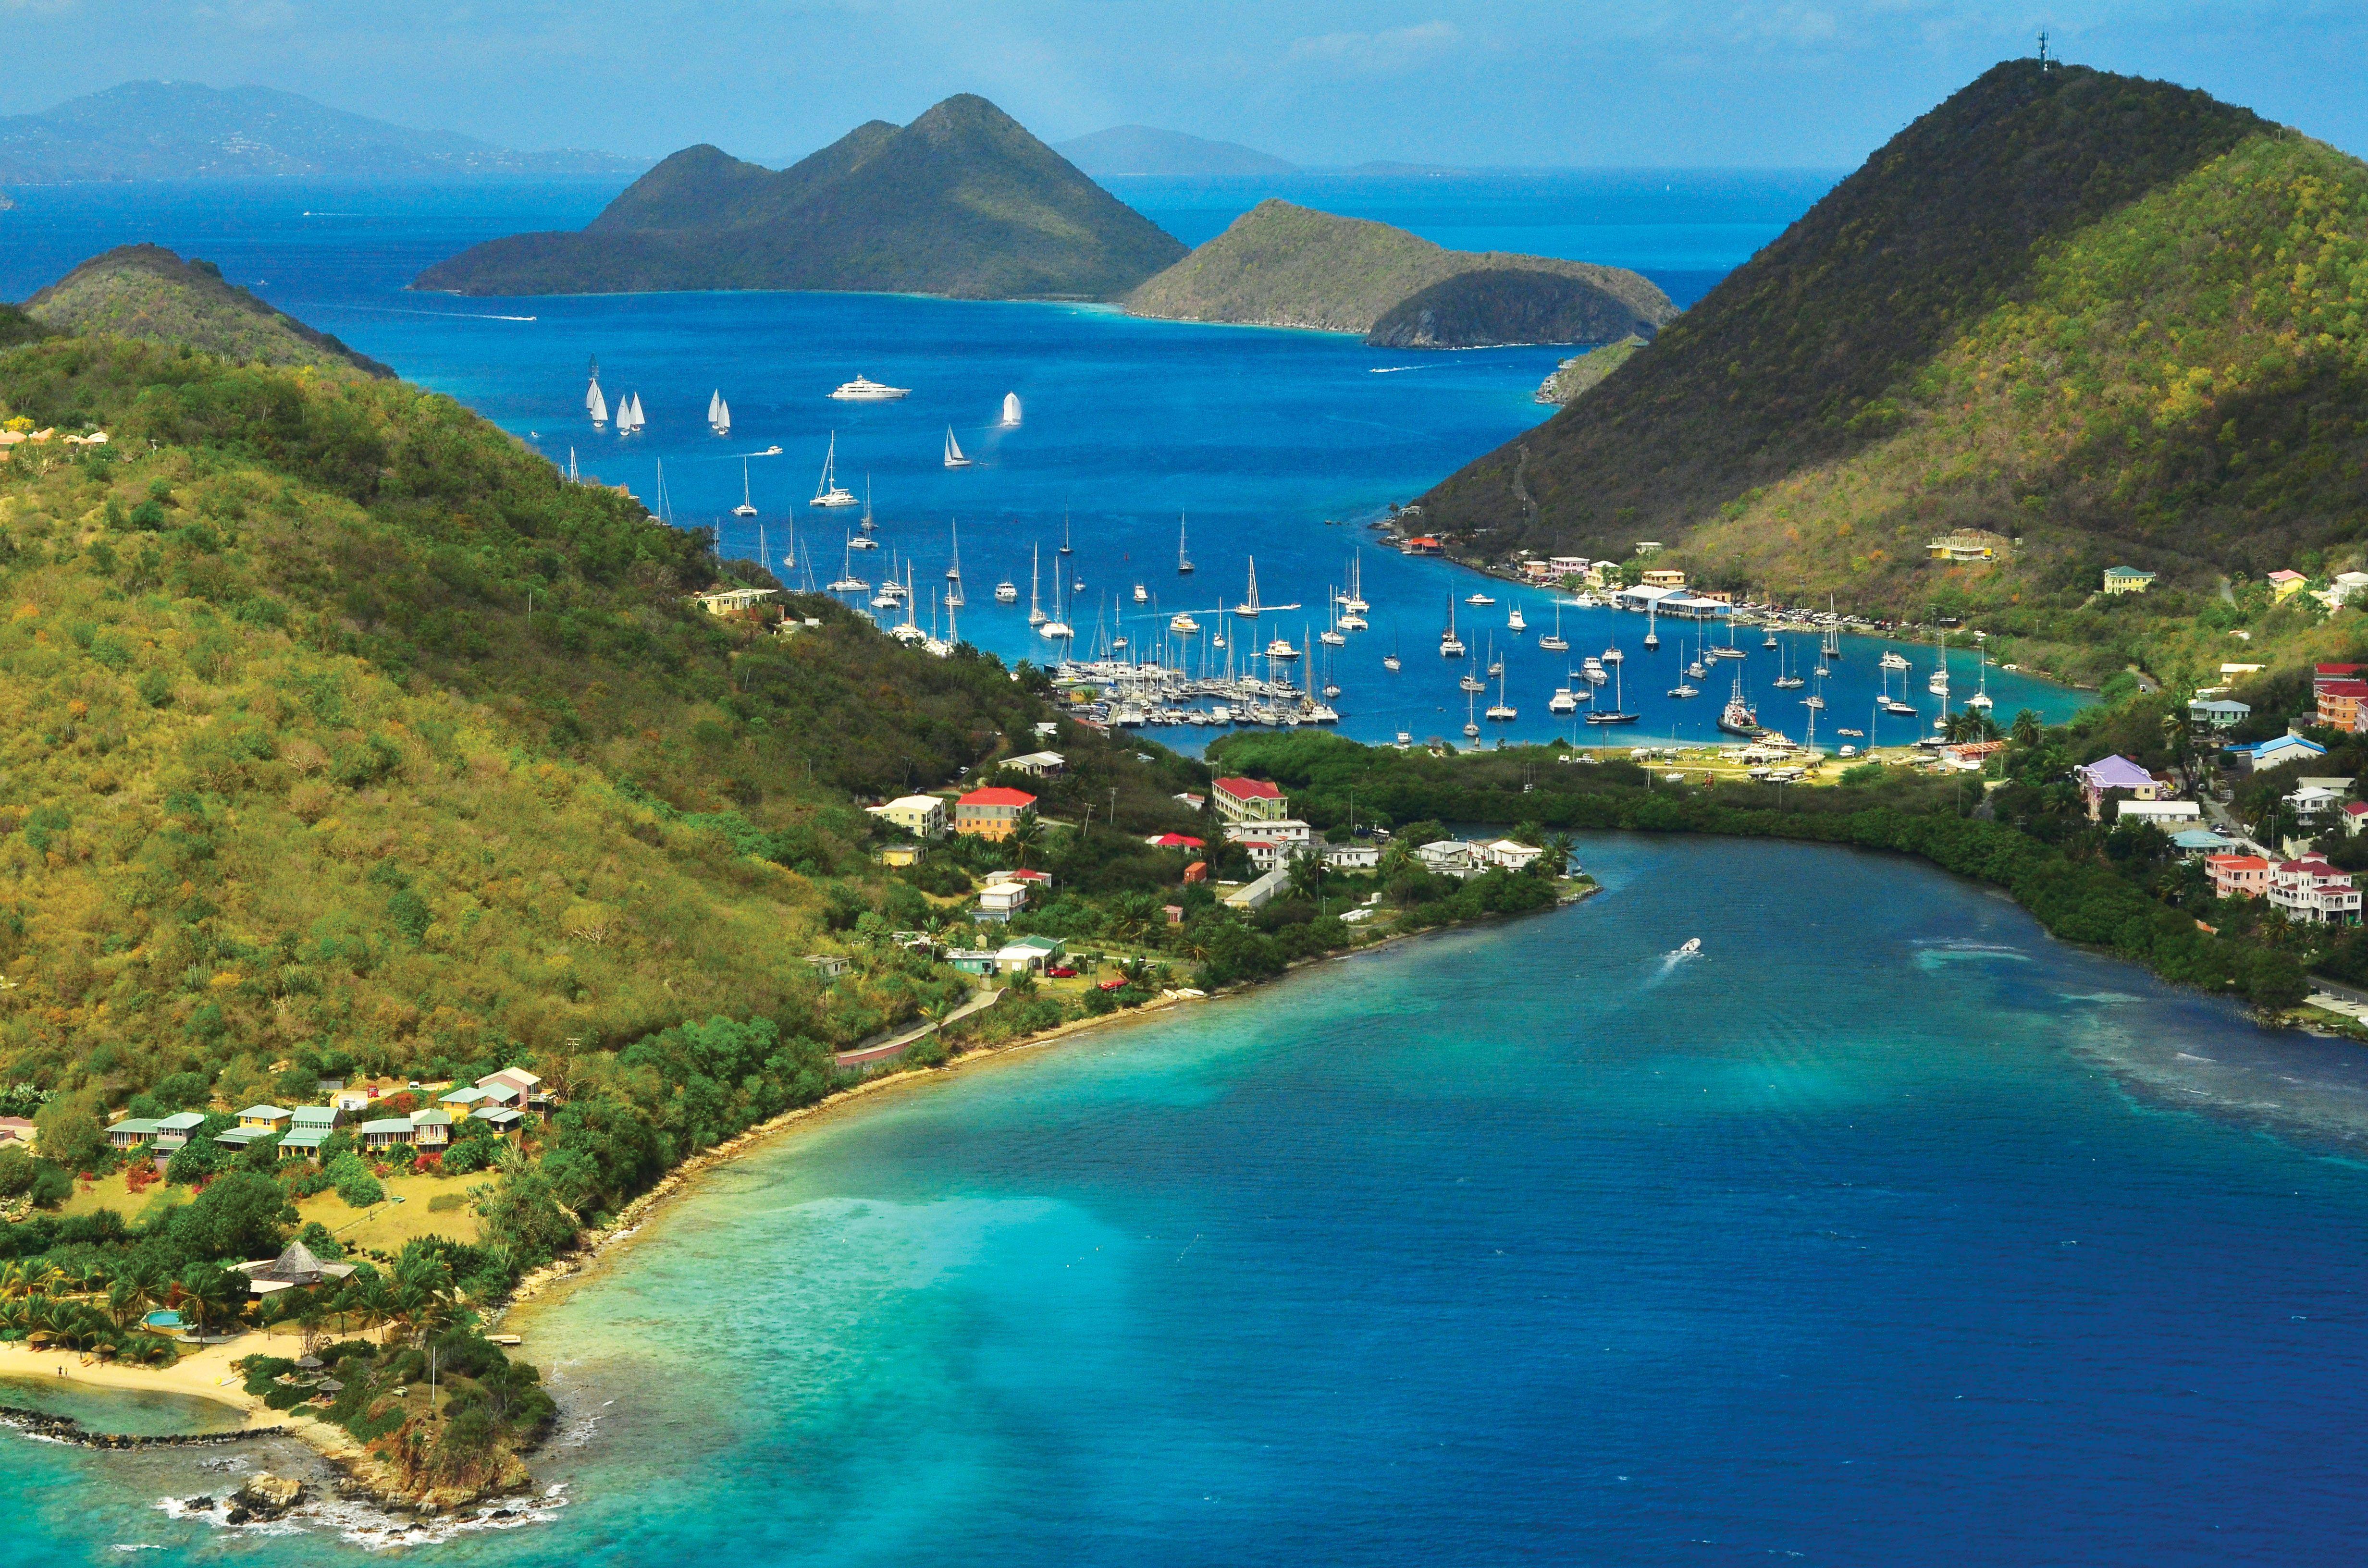 Bvi Yacht Charters Sailing Vacations